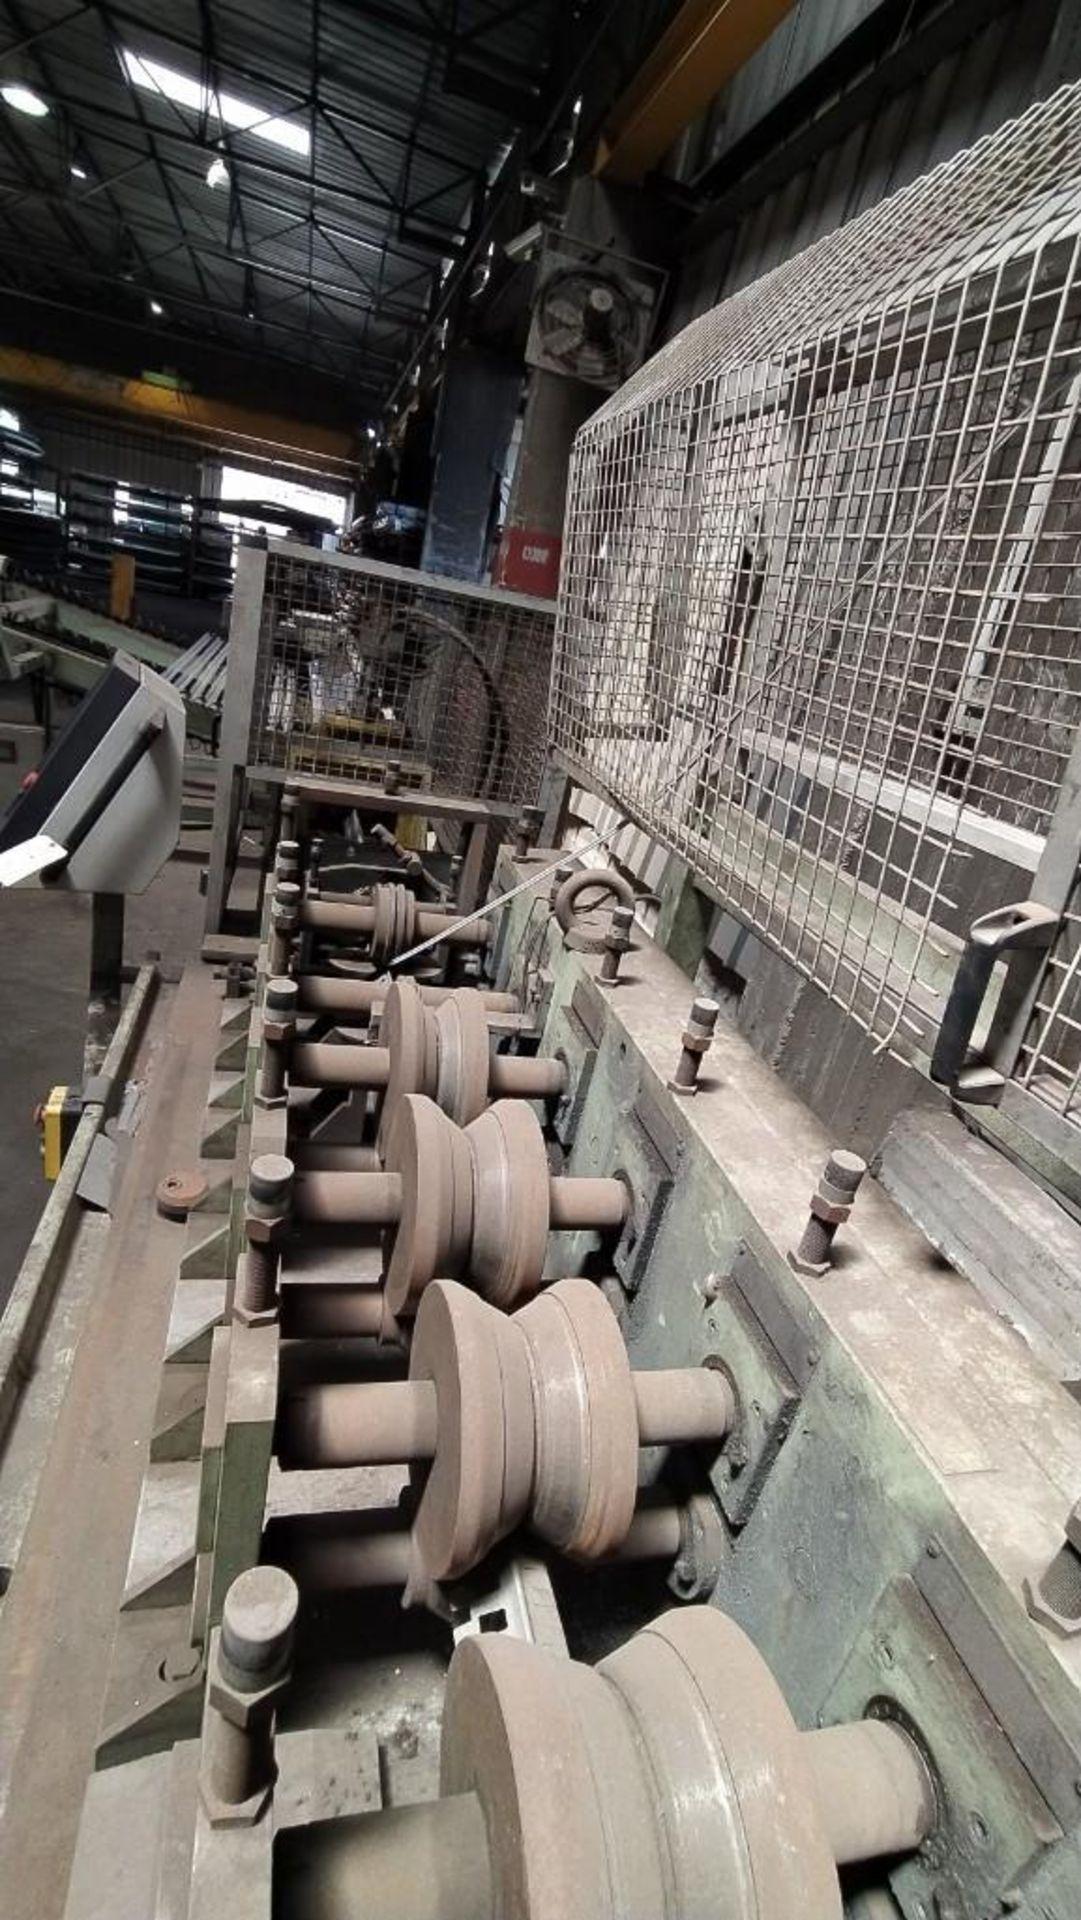 Lot 19 - DALLAN COMBI METAL CORNER ROLL FORMER AND PUNCHING MACHINE; MODEL B4R-18-200